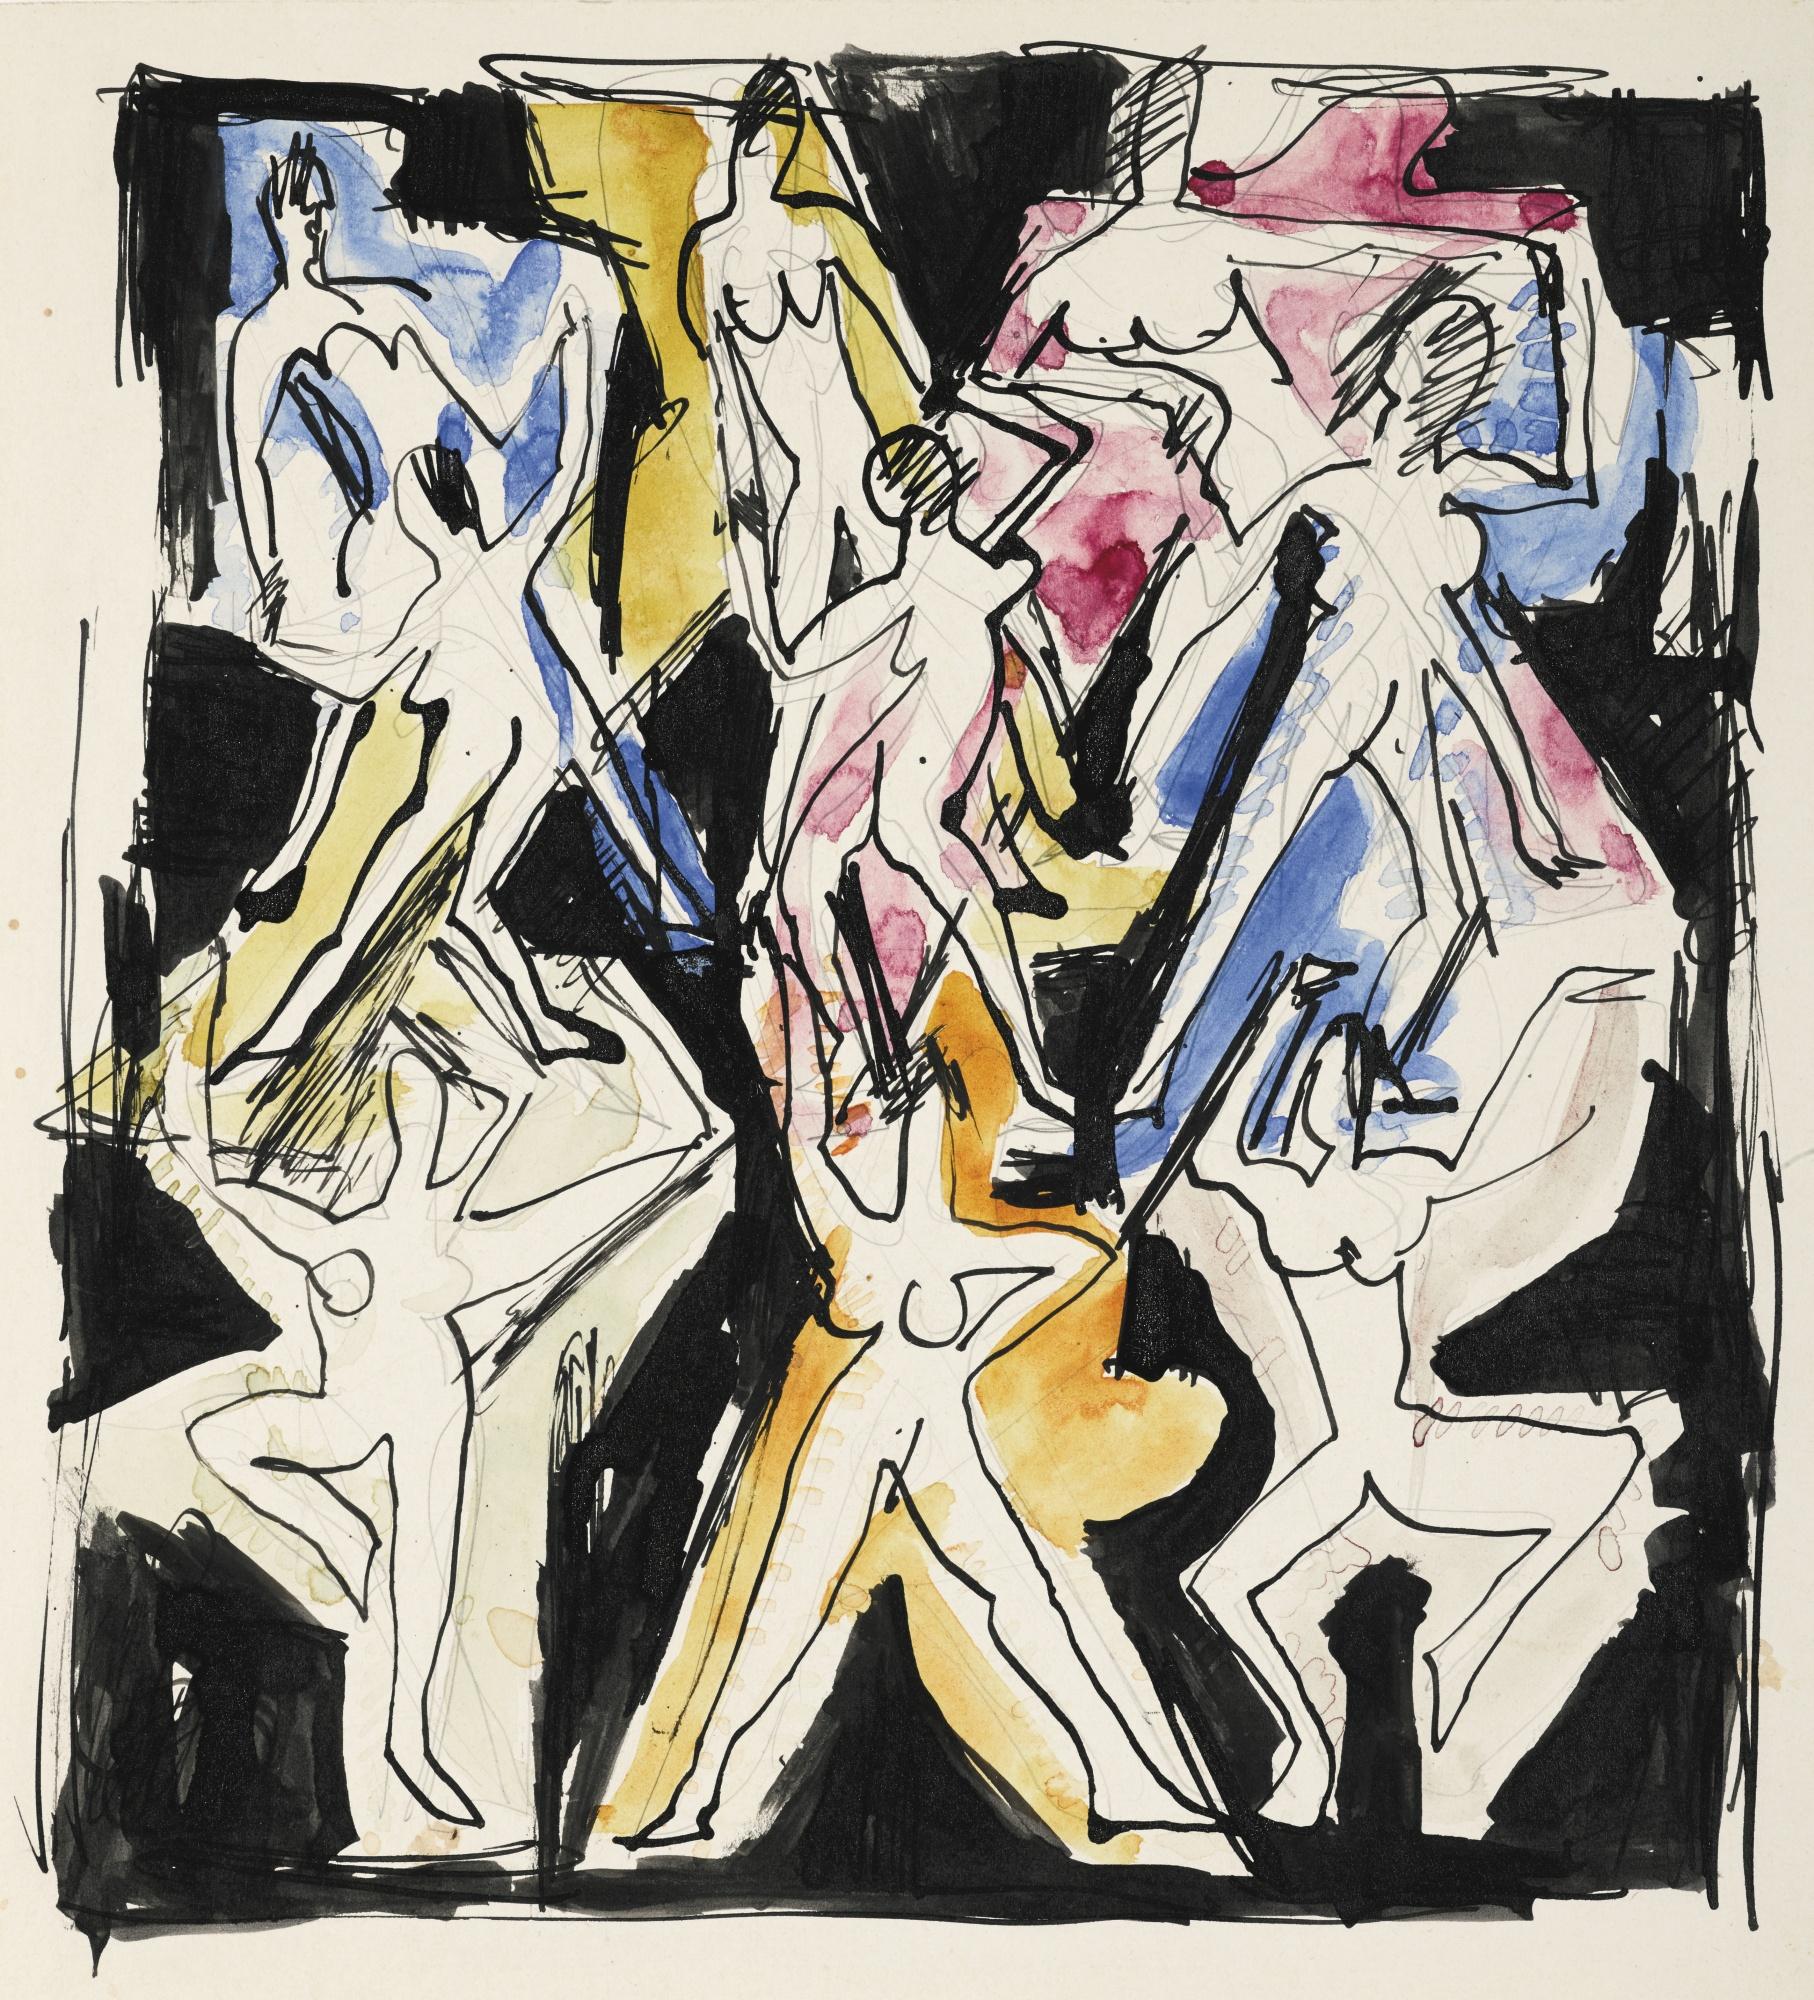 Ernst Ludwig Kirchner-Tanzfiguration (Skizze Fur Wandbild)(Dance Figuration (Sketch For Mural))-1936